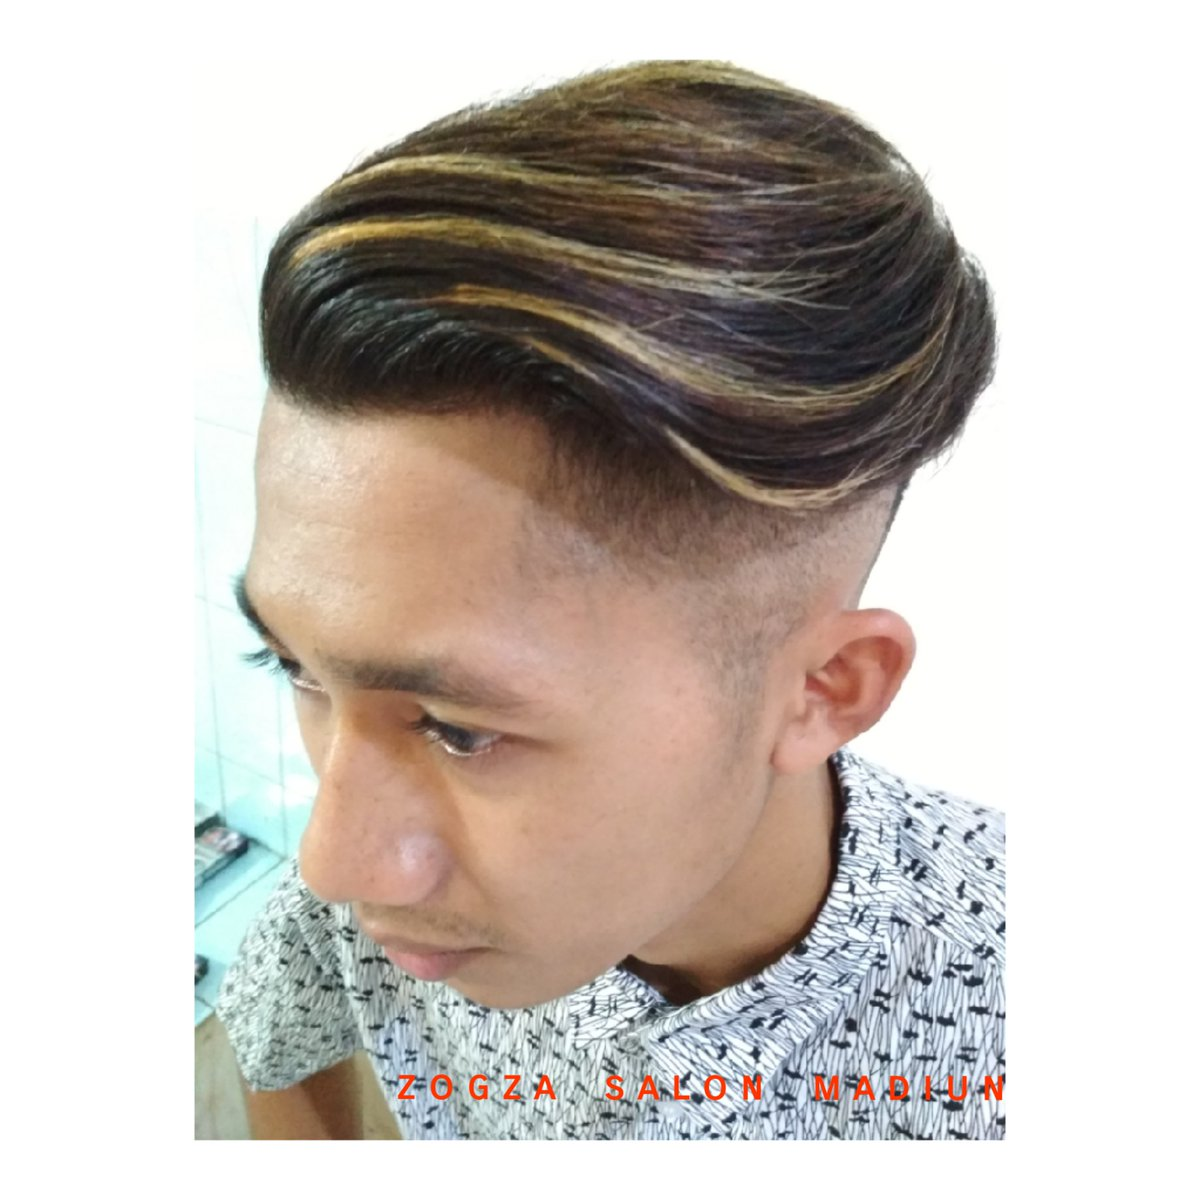 Barbershopsragen Hashtag On Twitter Semir Rambut Hi Top 0 Replies Retweets 1 Like